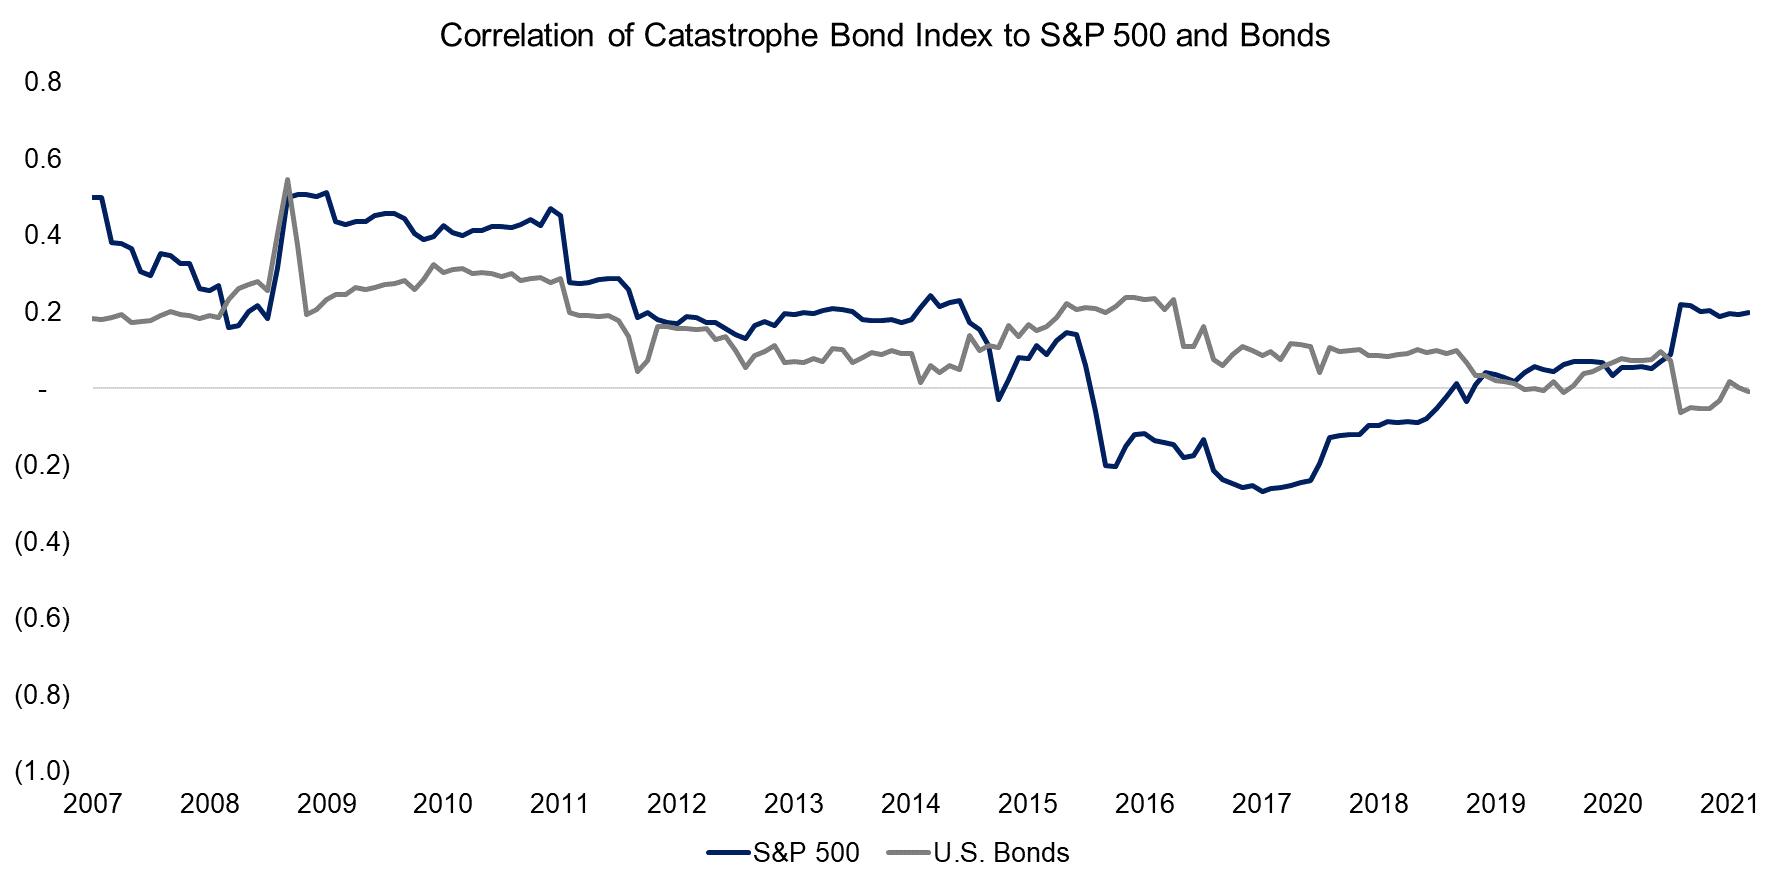 Correlation of Catastrophe Bond Index to S&P 500 and Bonds